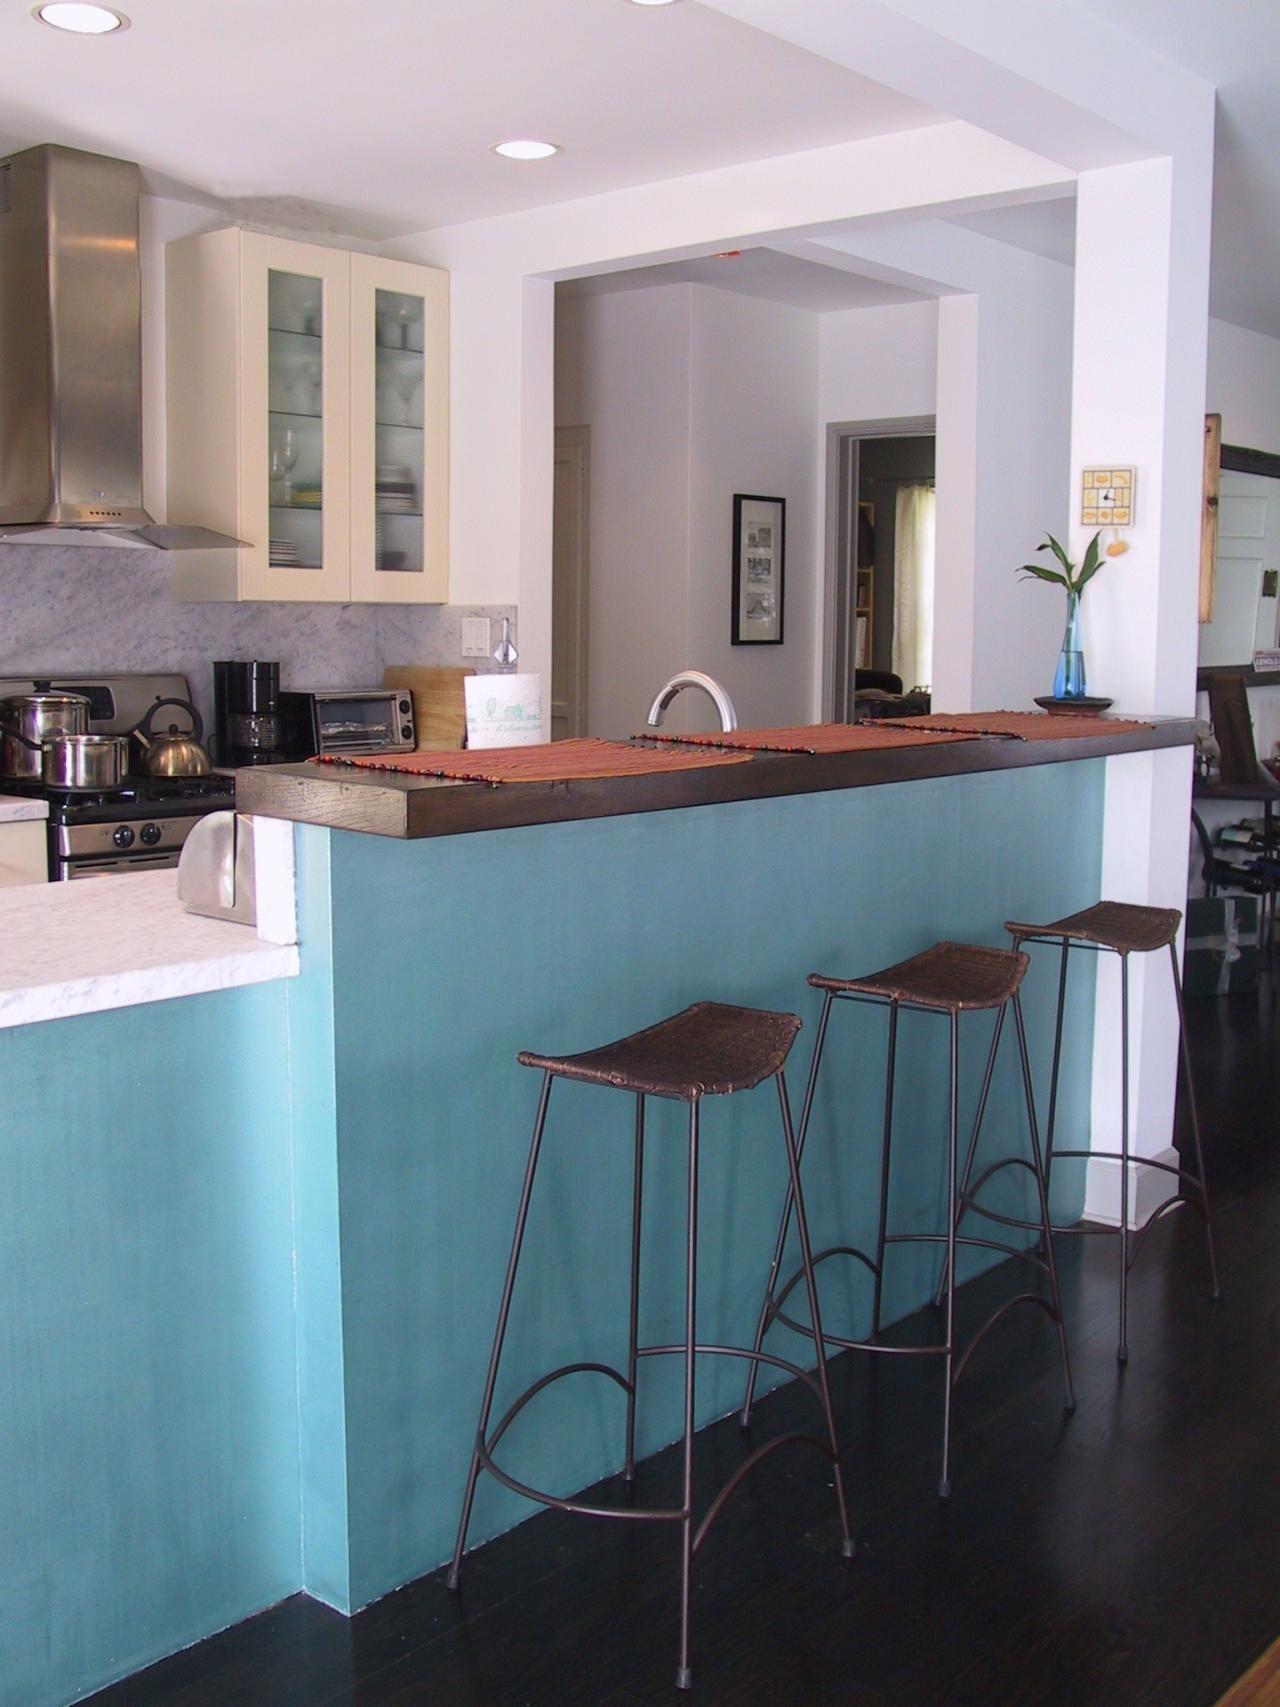 Three metal barstools sit at a kitchen counter bar painted a cheery ...